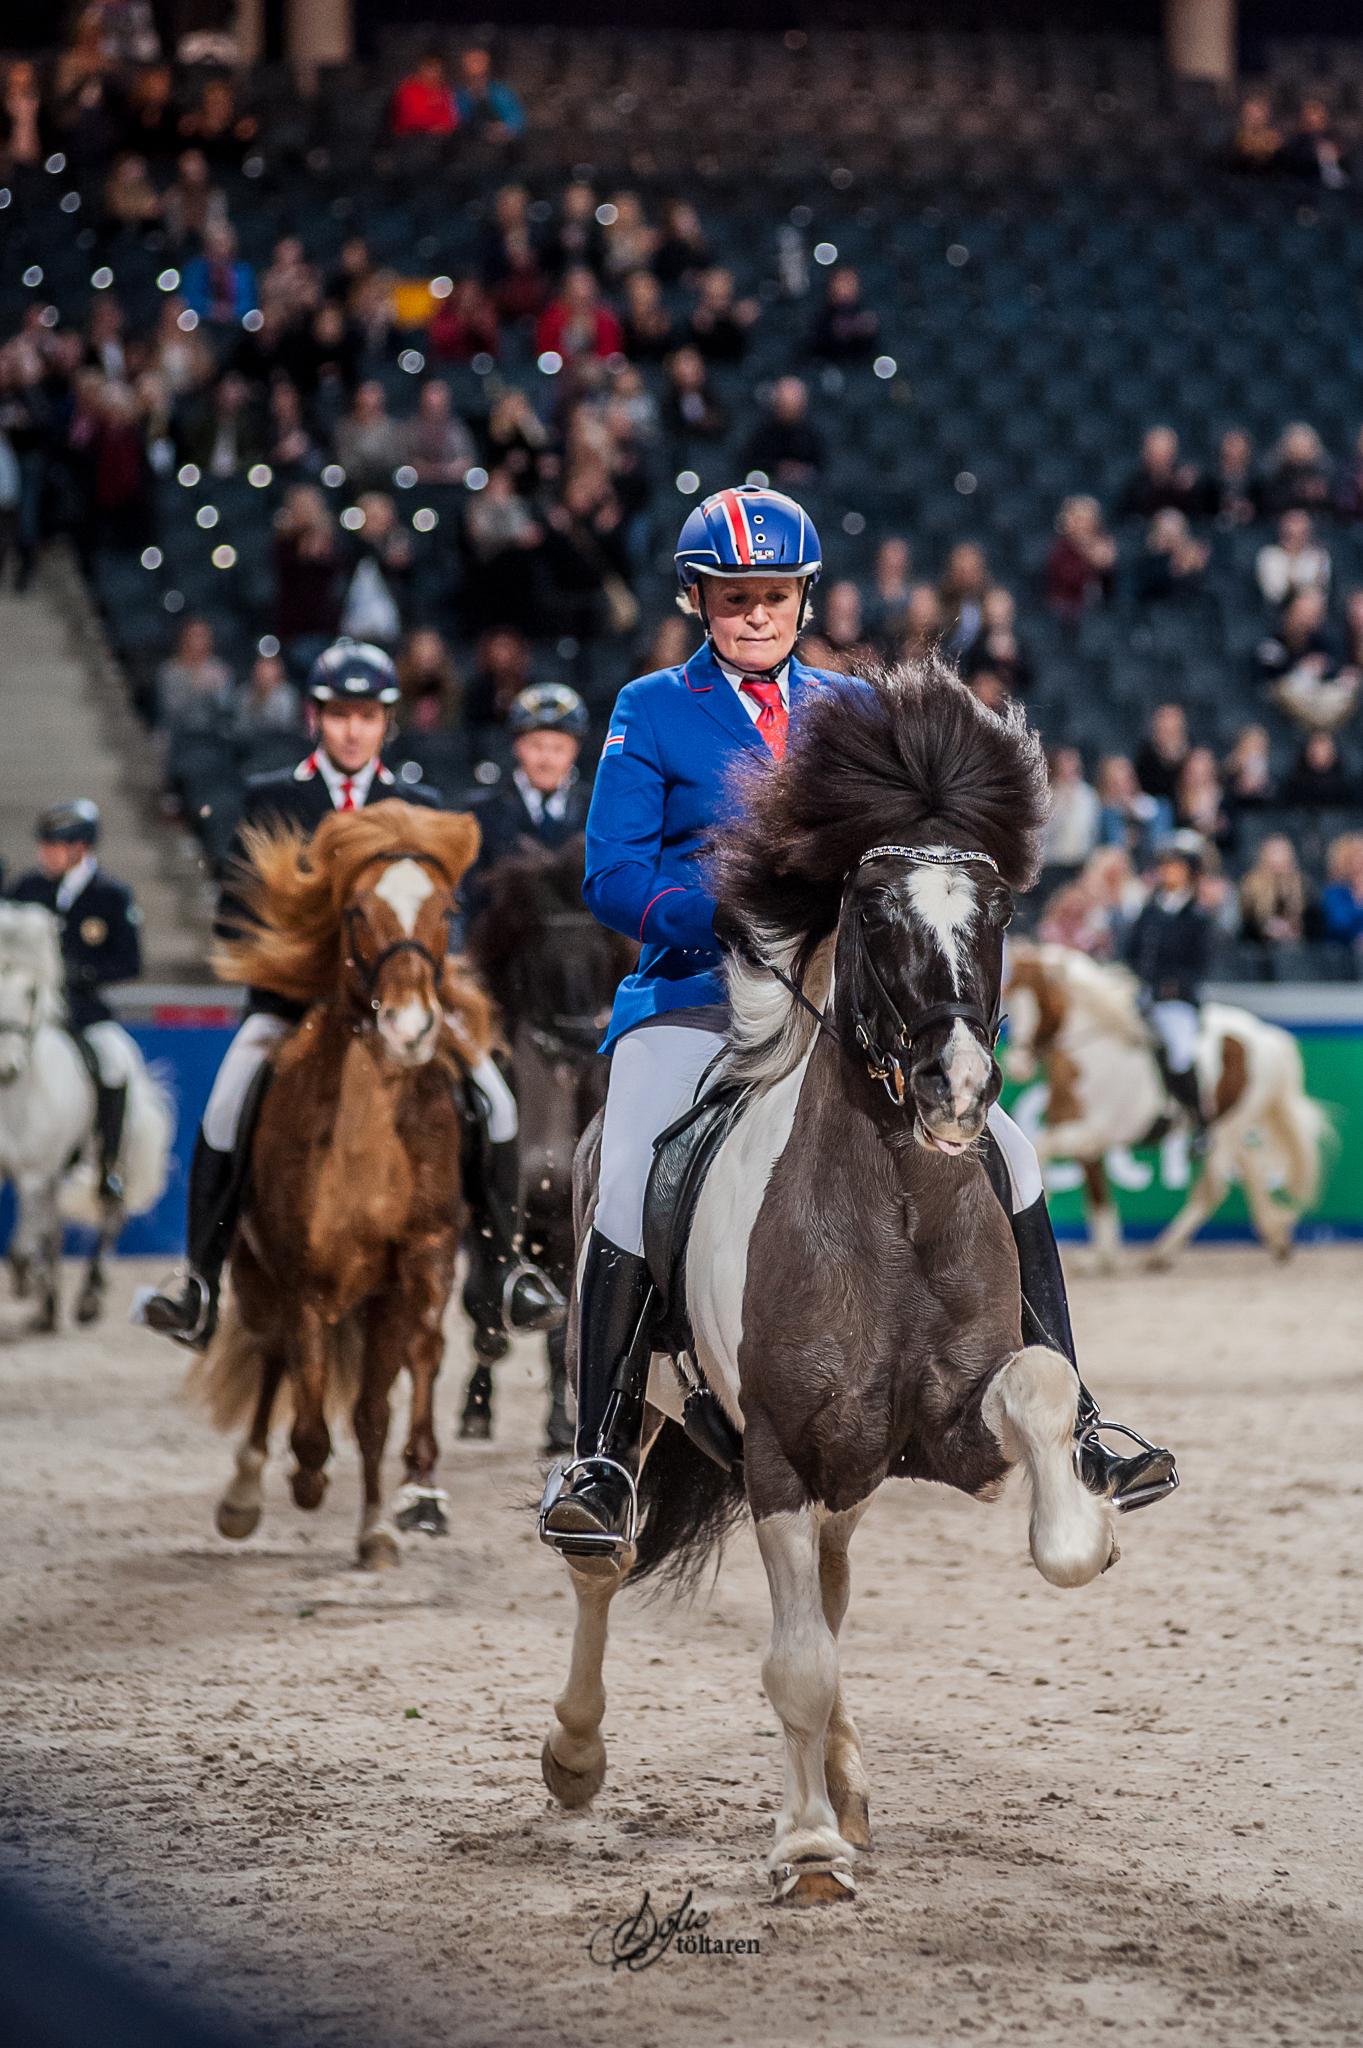 Foto: Sofie Lahtinen Carlsson, www.toltaren.wordpress.com